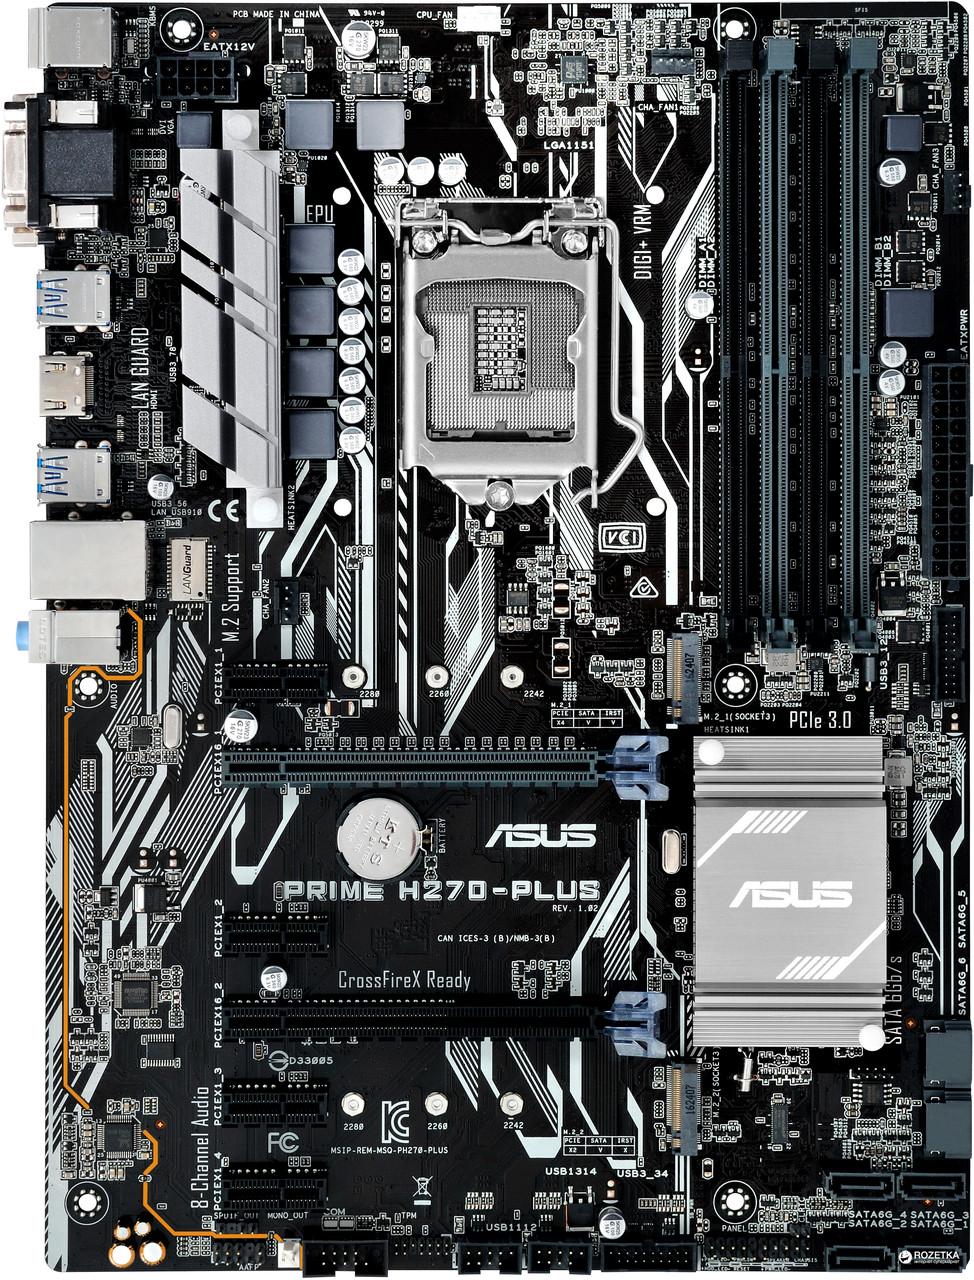 Материнская плата Asus Prime H270-Plus (s1151, Intel H270, PCI-Ex16) #100997-1